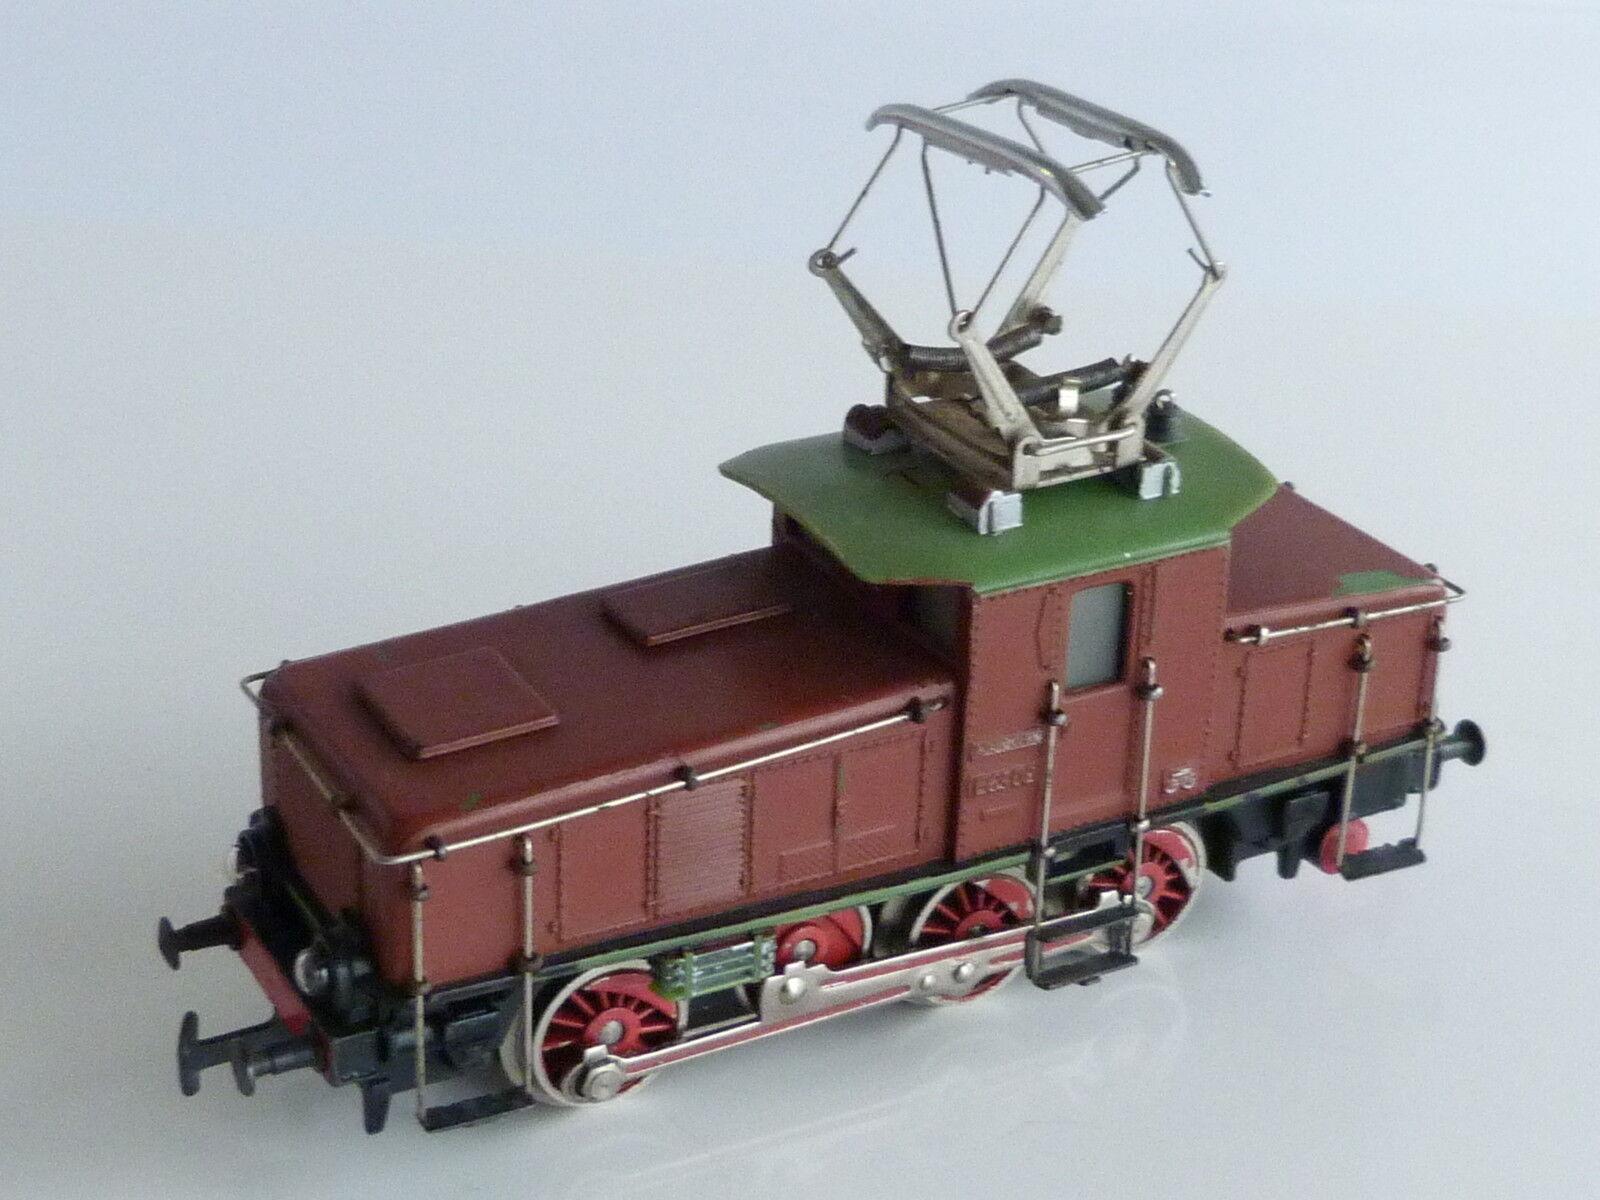 Marklin electric locomotive e 63 02 repainted